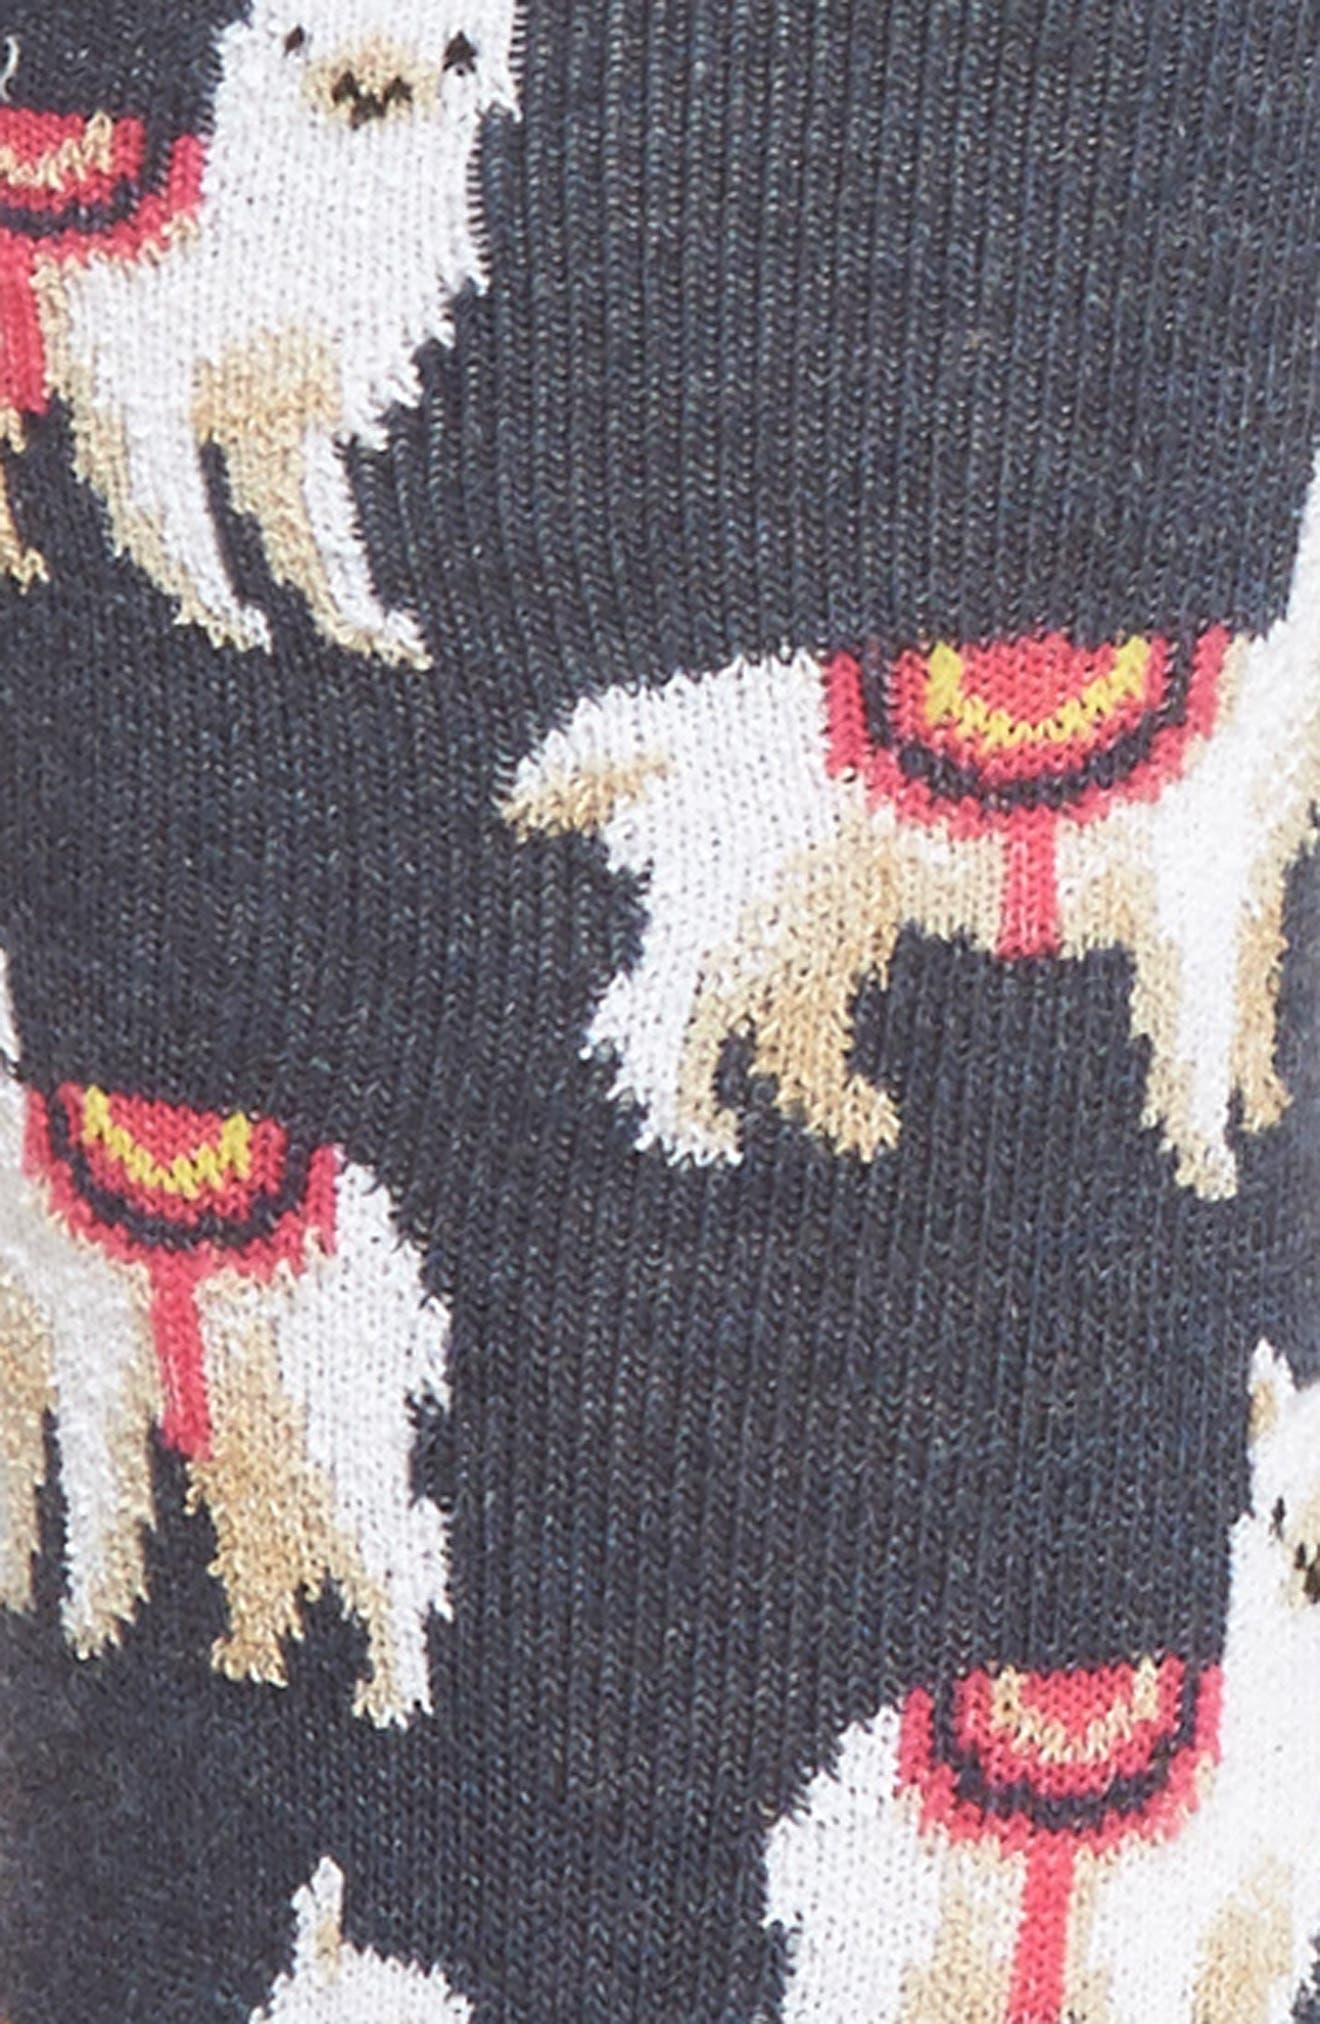 Llamas Crew Socks,                             Alternate thumbnail 2, color,                             Denim Heather